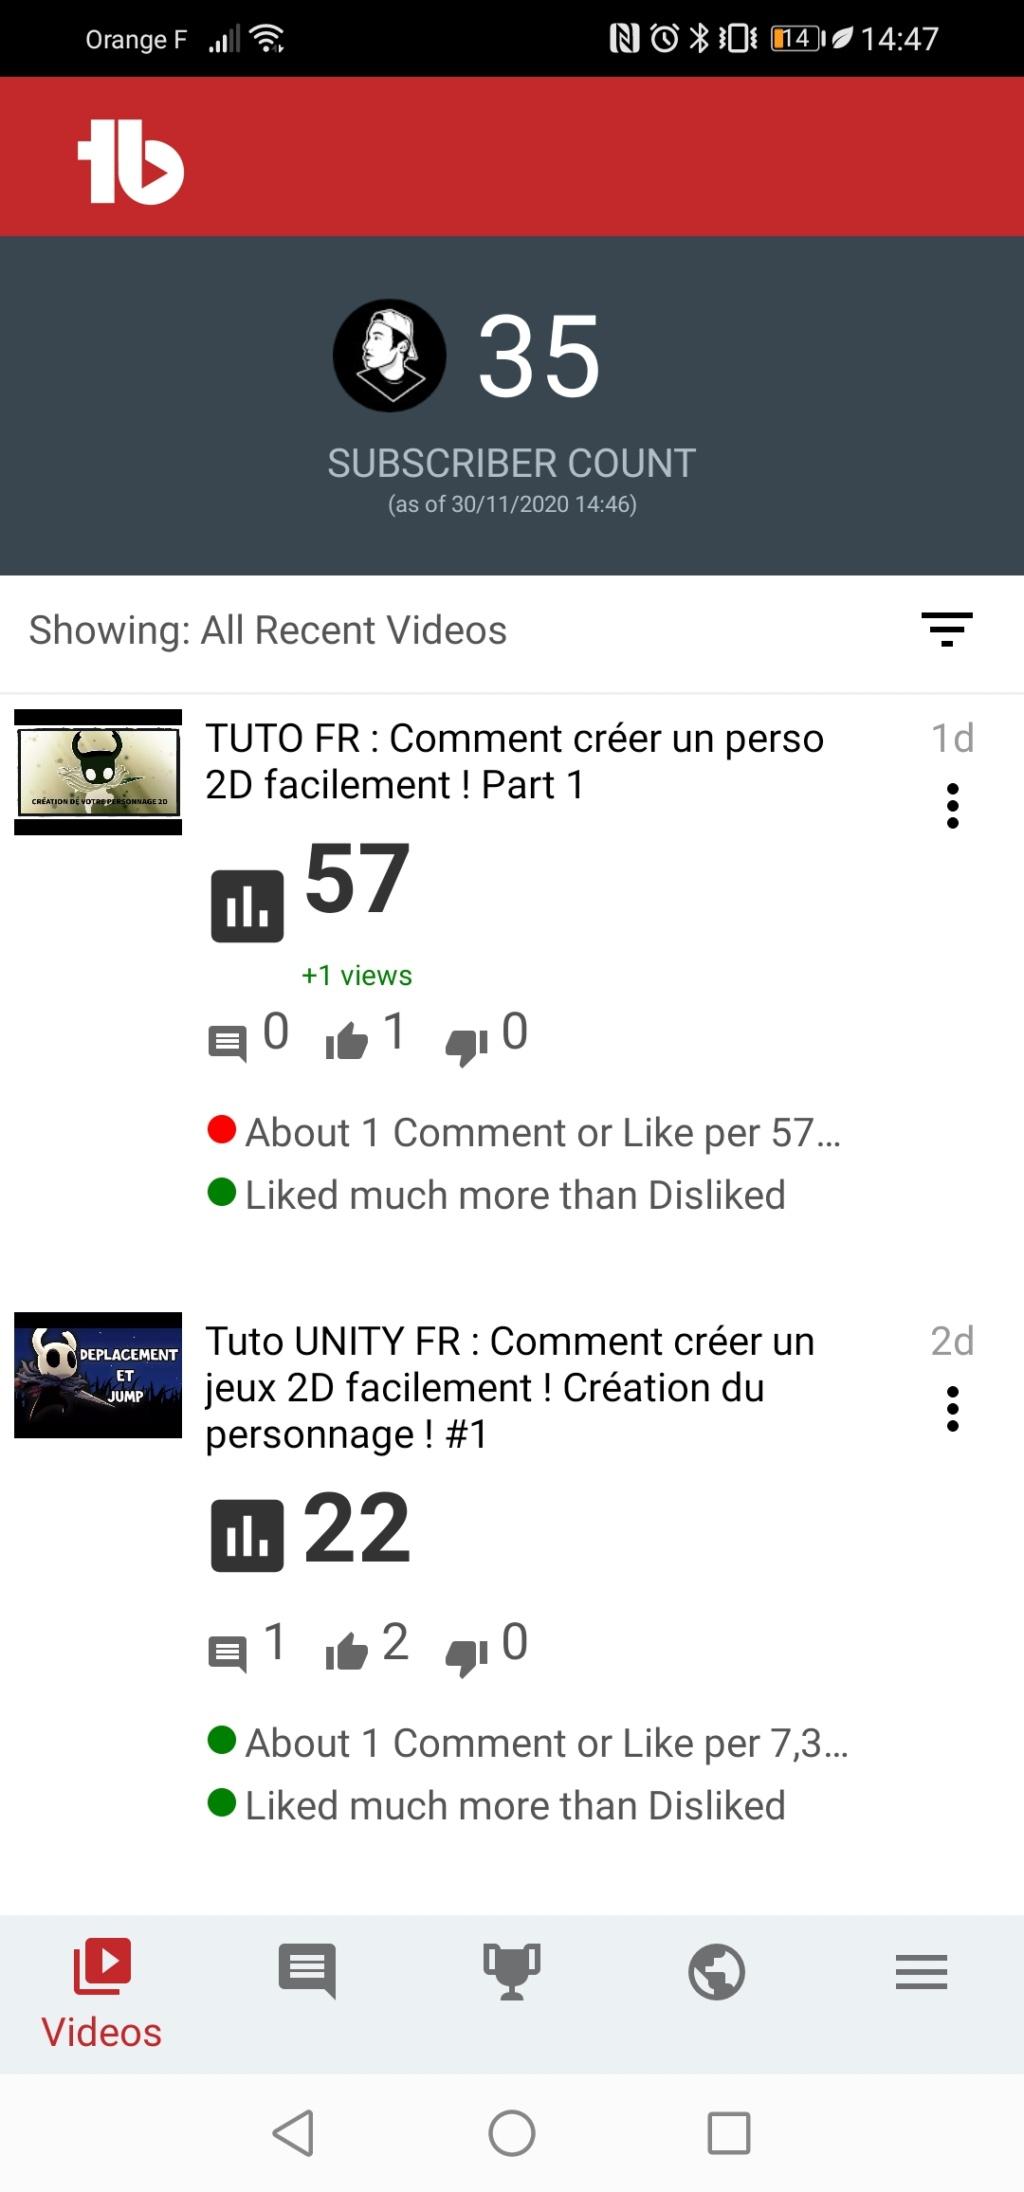 [Chaîne] KingDara [Création de jeux vidéo][Tuto][DevLog][Unity] Screen11